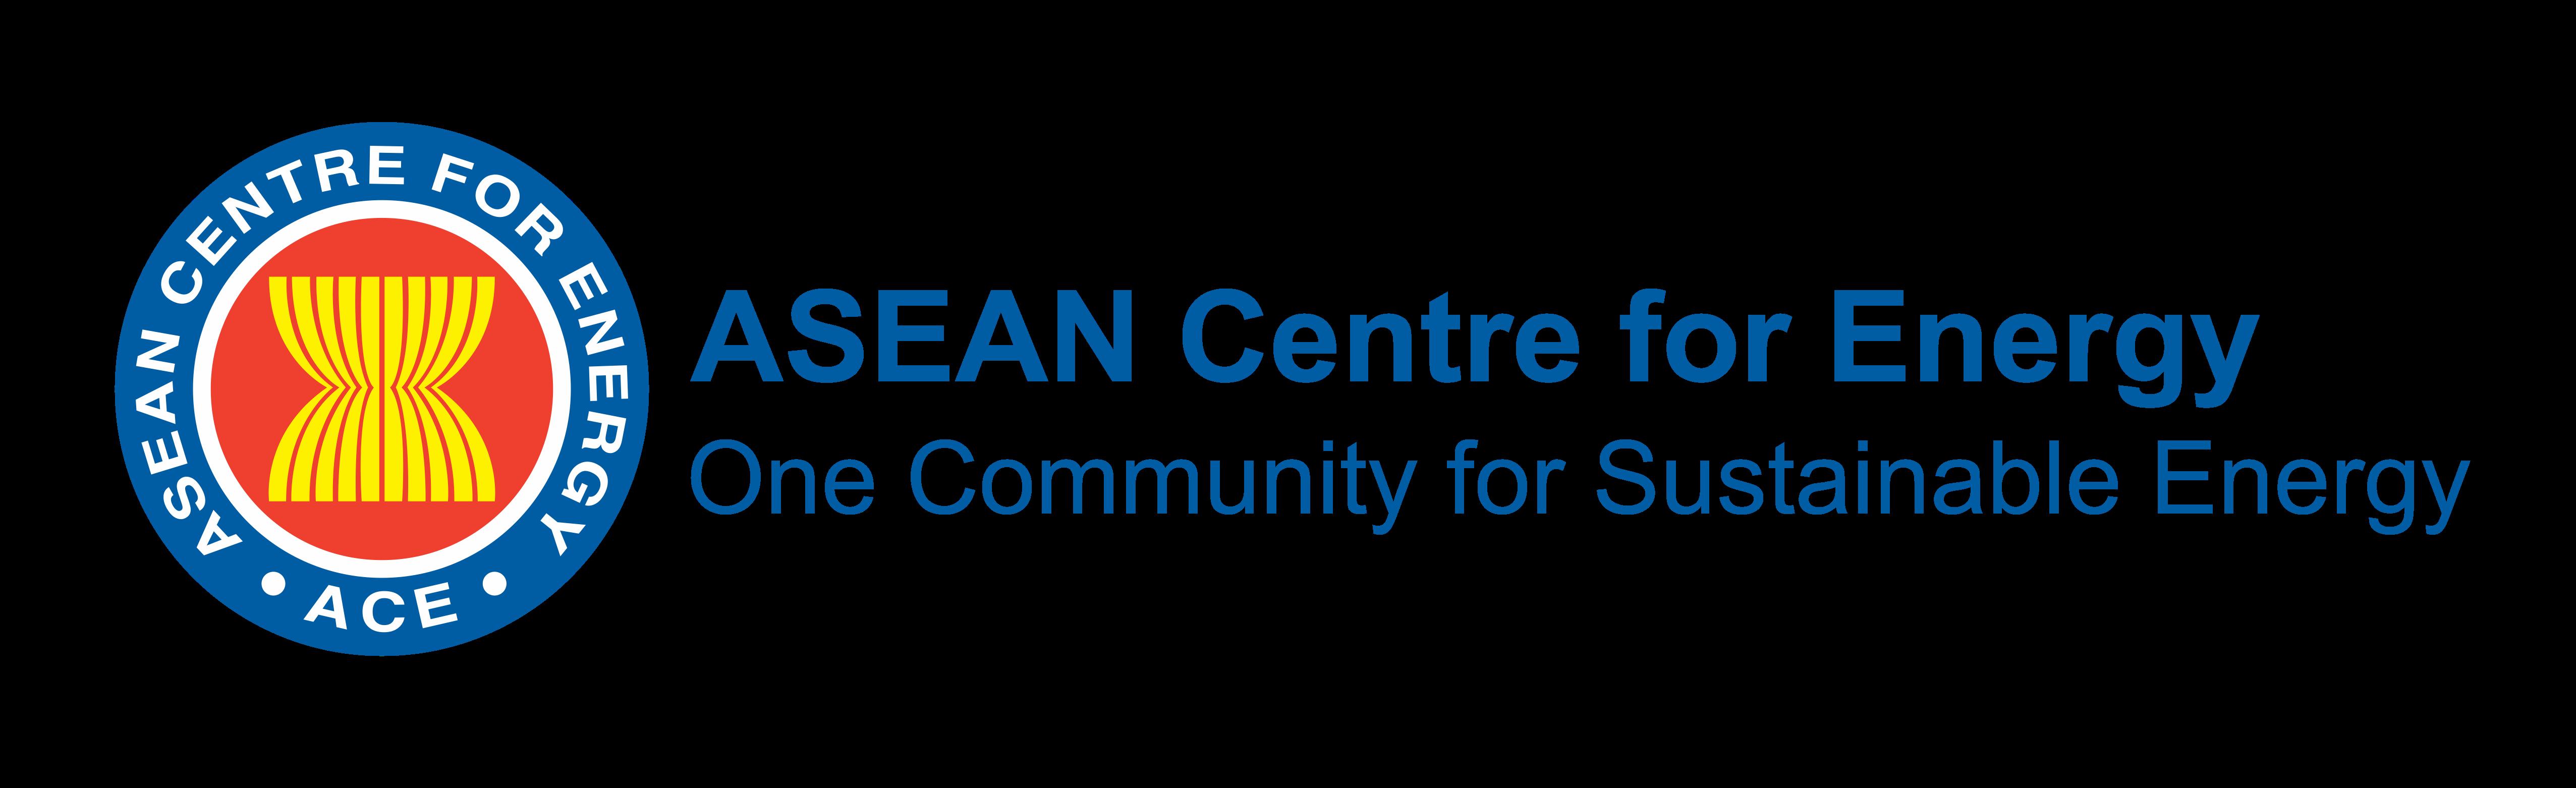 ASEAN Centre for Energy Registration System